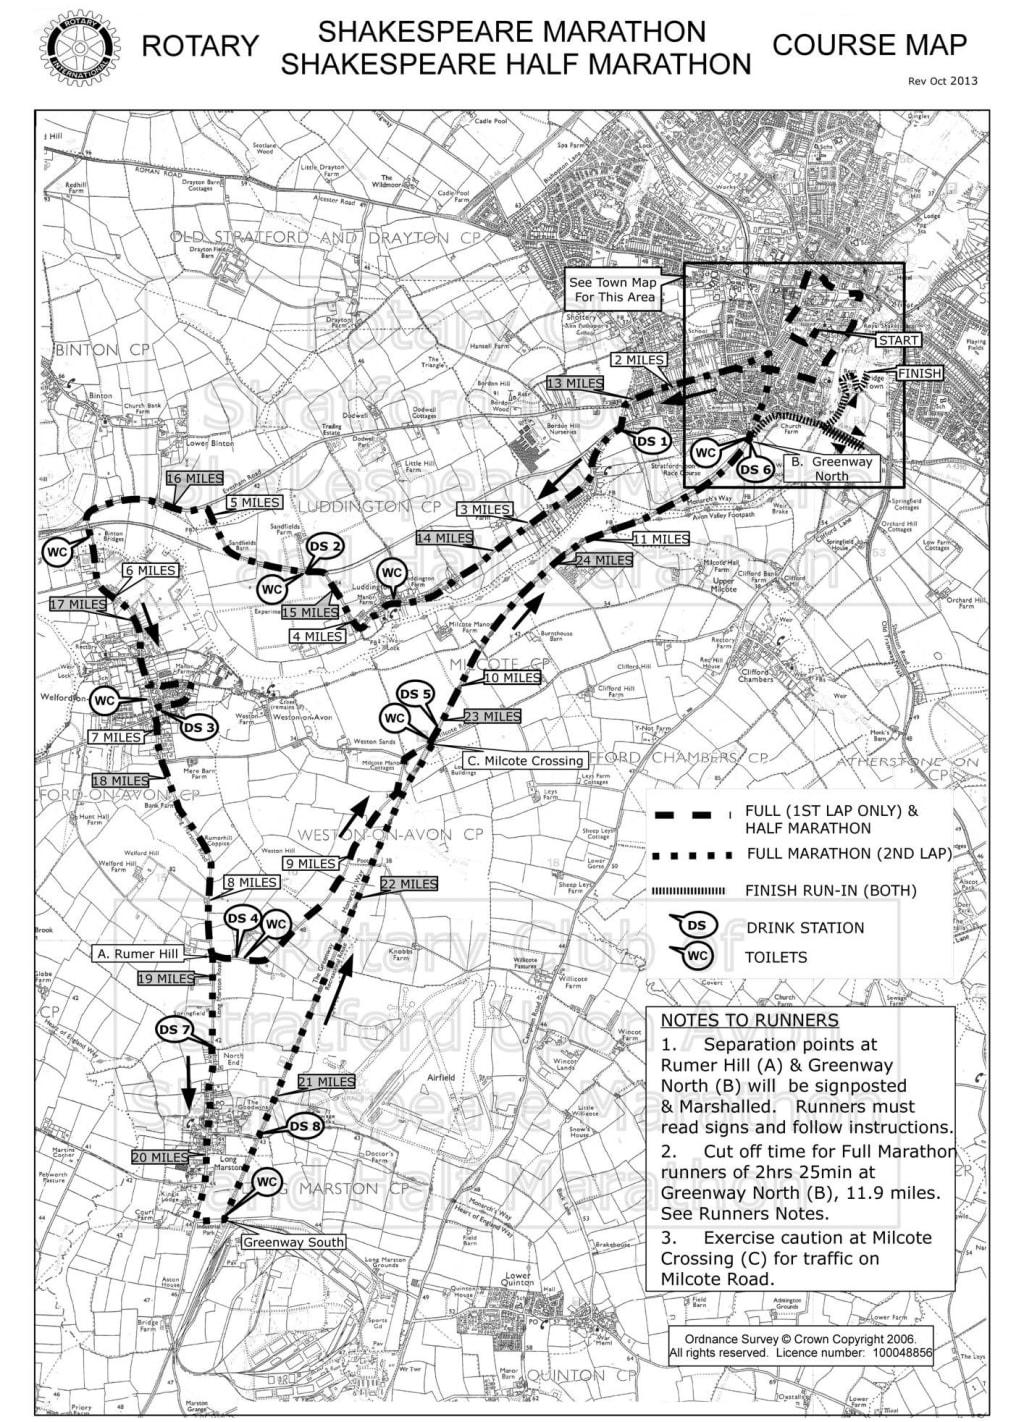 Rotary-Shakespeare-Marathon-Half-Marathon-Map.jpg